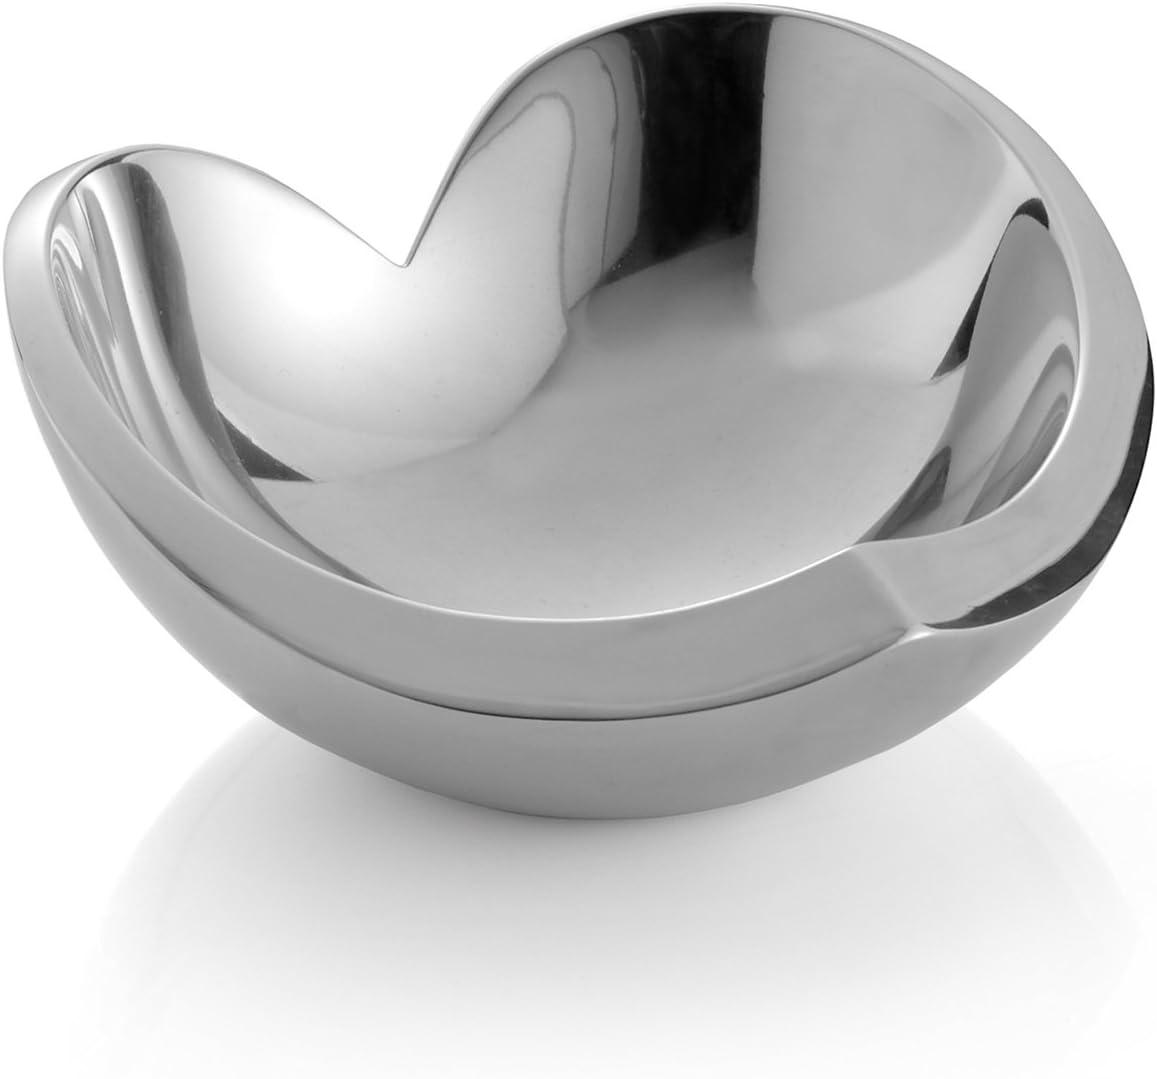 Nambe Alloy Classic Heart Bowl 8.5